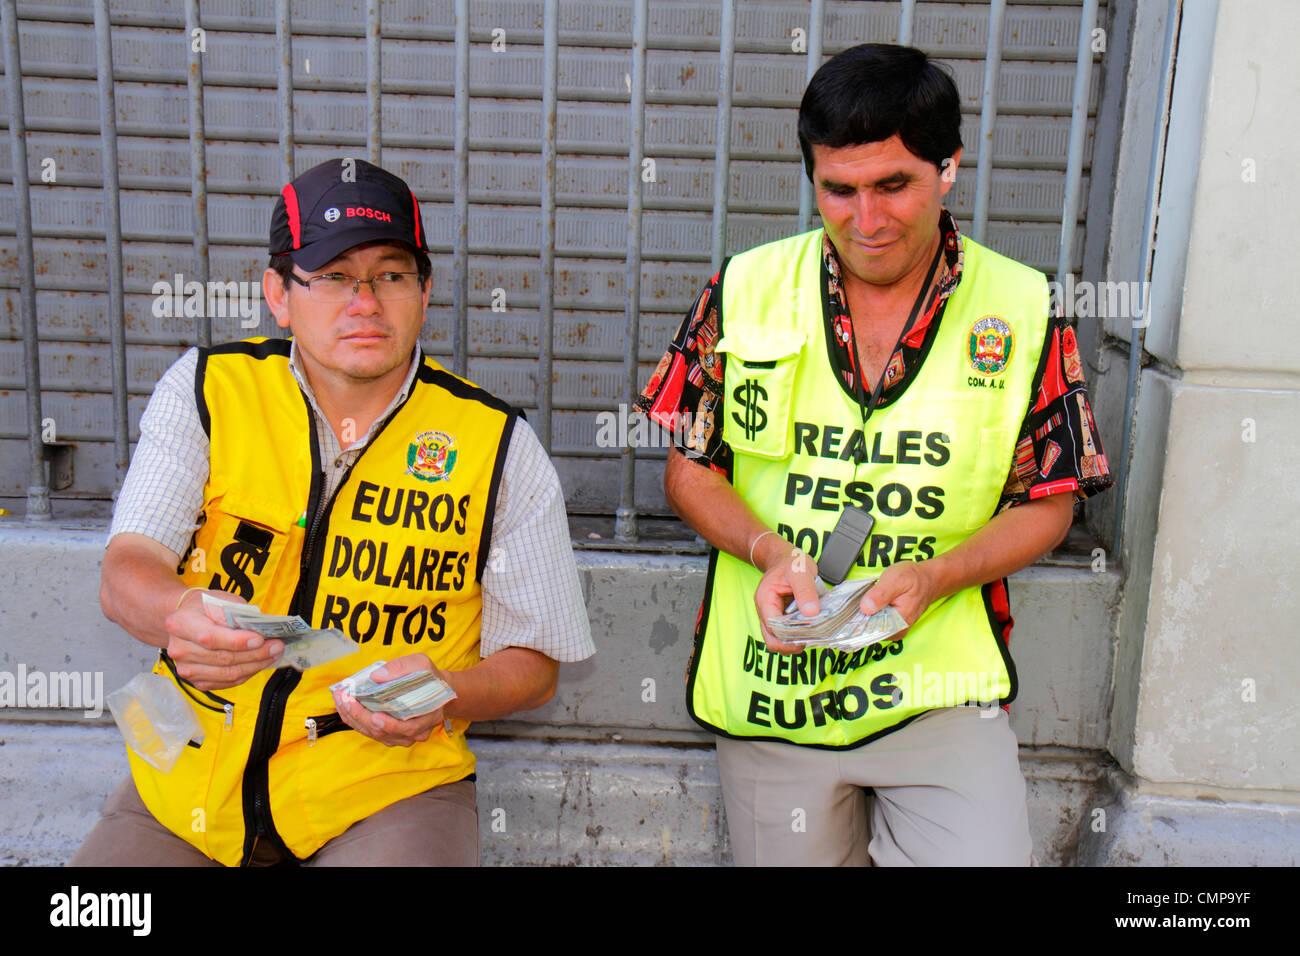 Pesos Tourism Tourist Stock Photos Pesos Tourism Tourist Stock  # Muebles Liquidatodo Valladolid